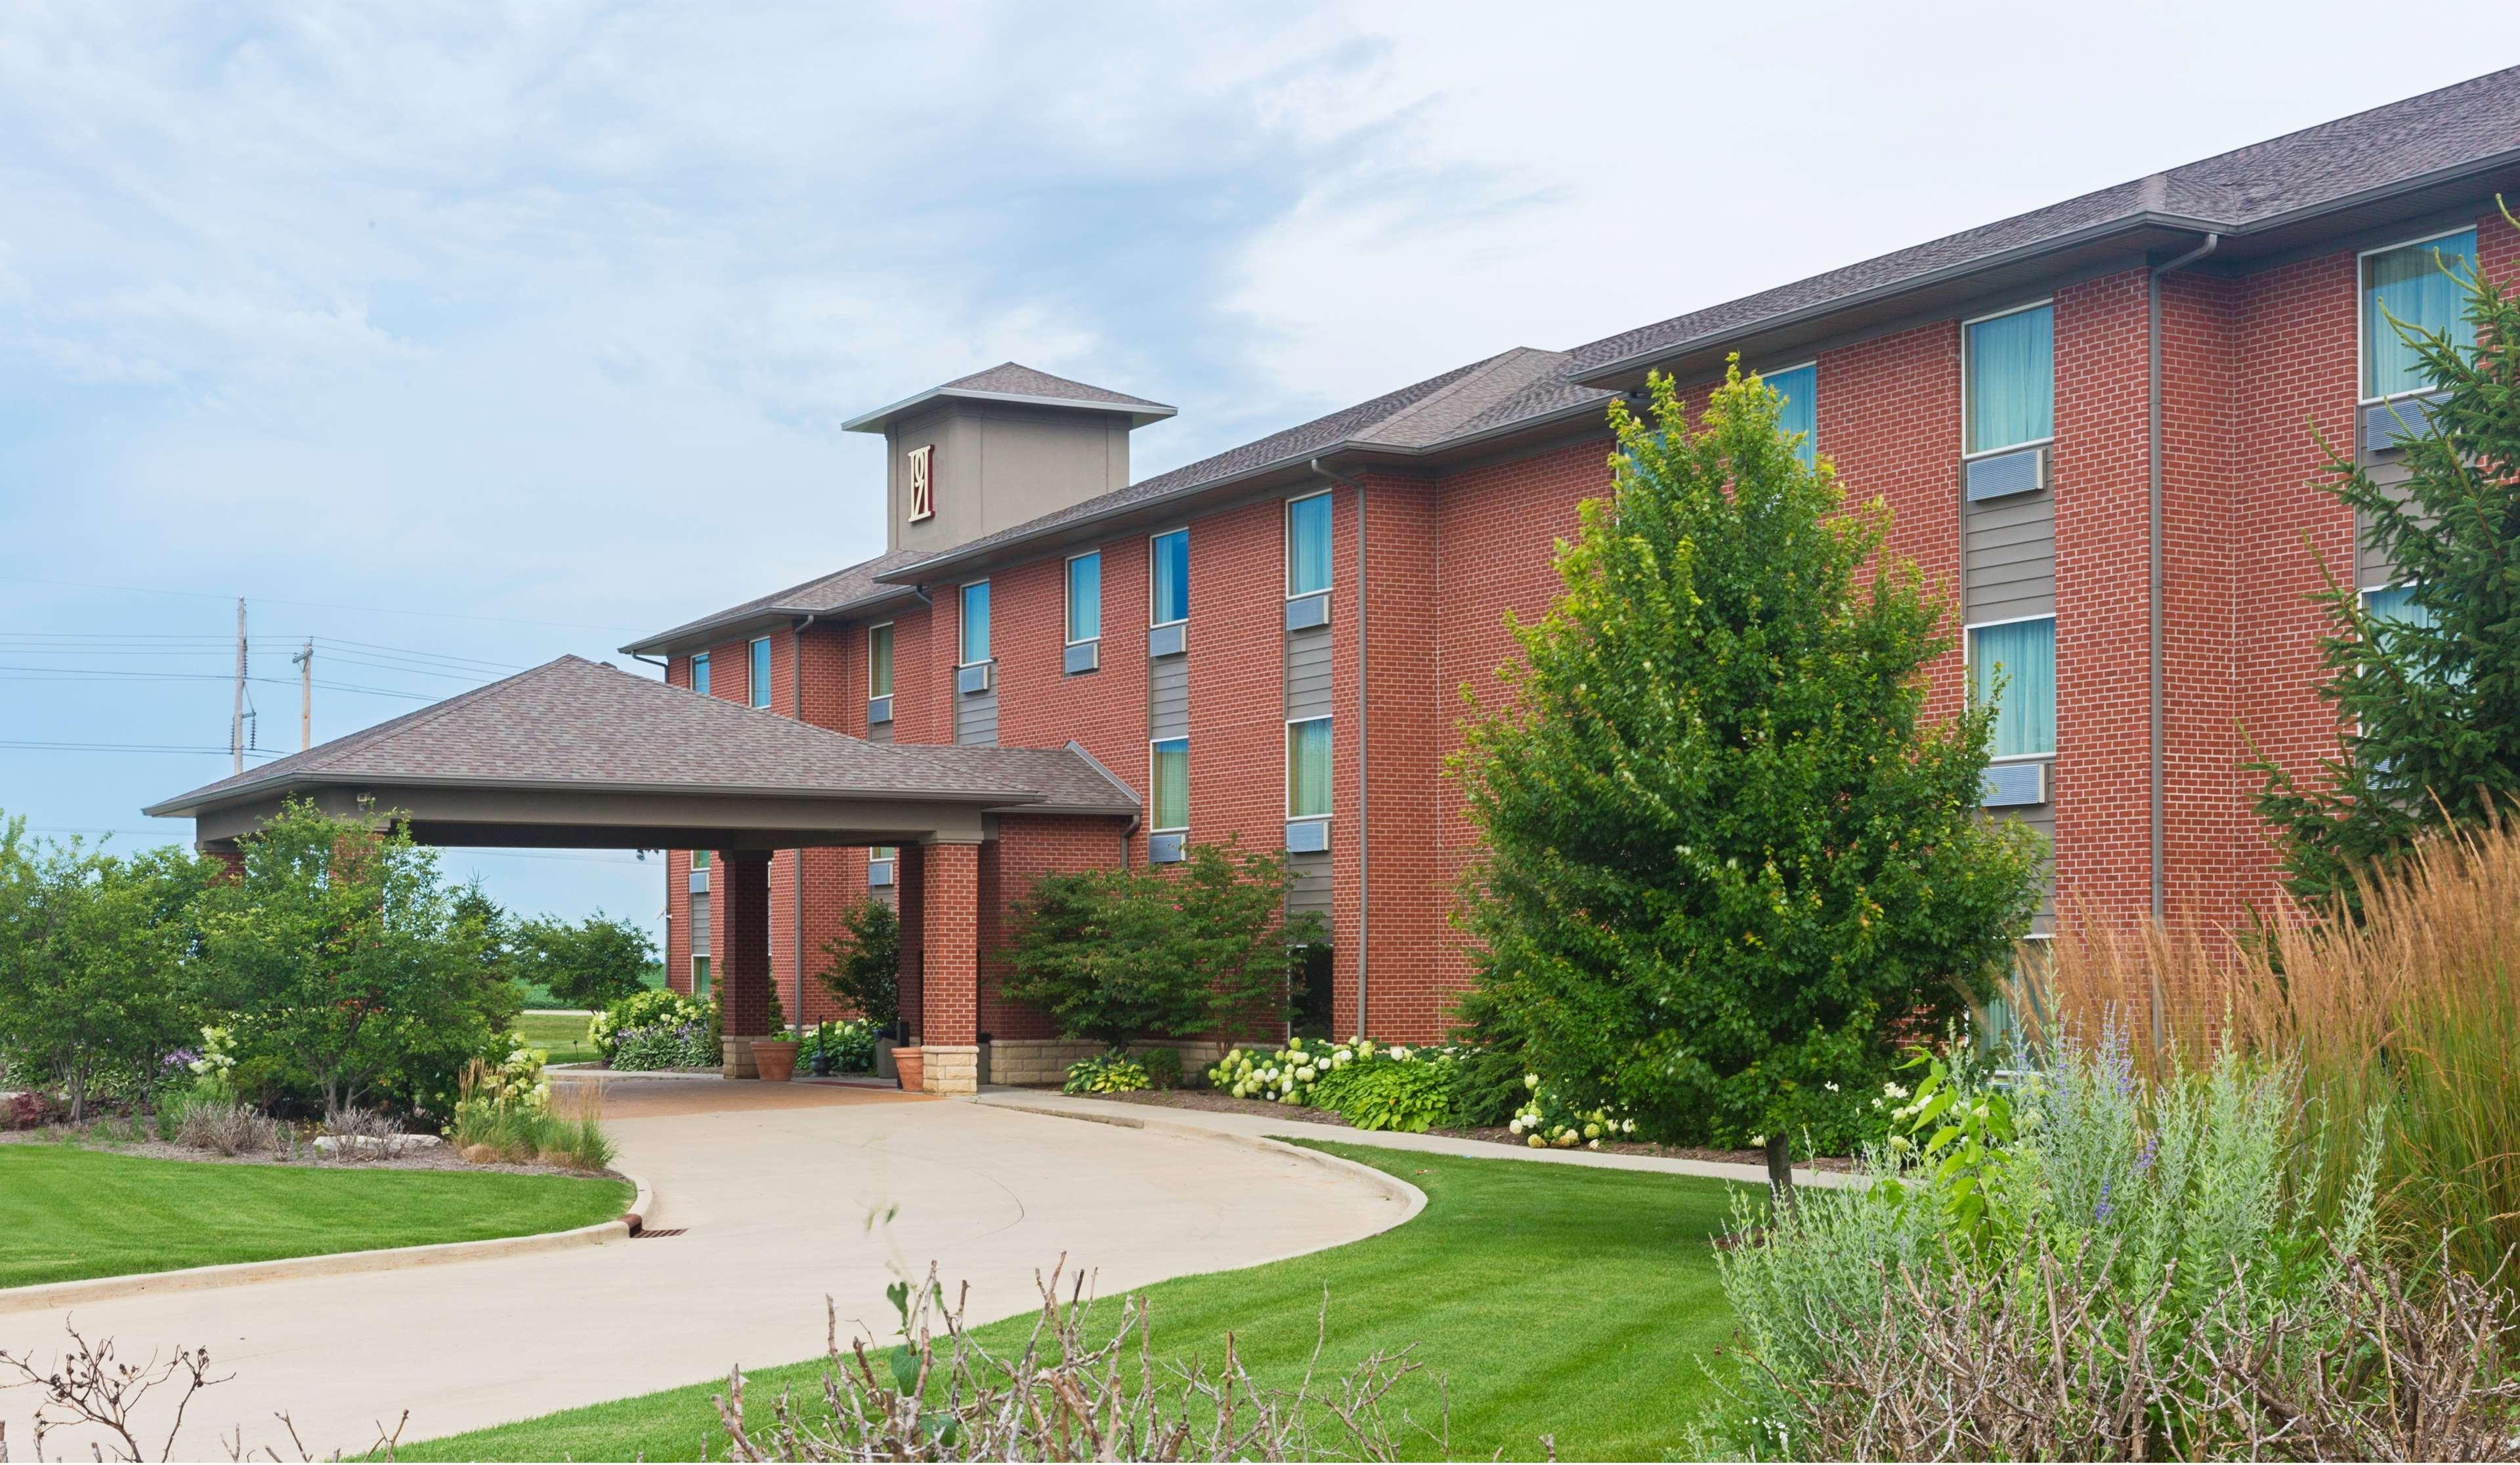 Parke Regency Hotel & Conference Ctr, BW Premier, McLean